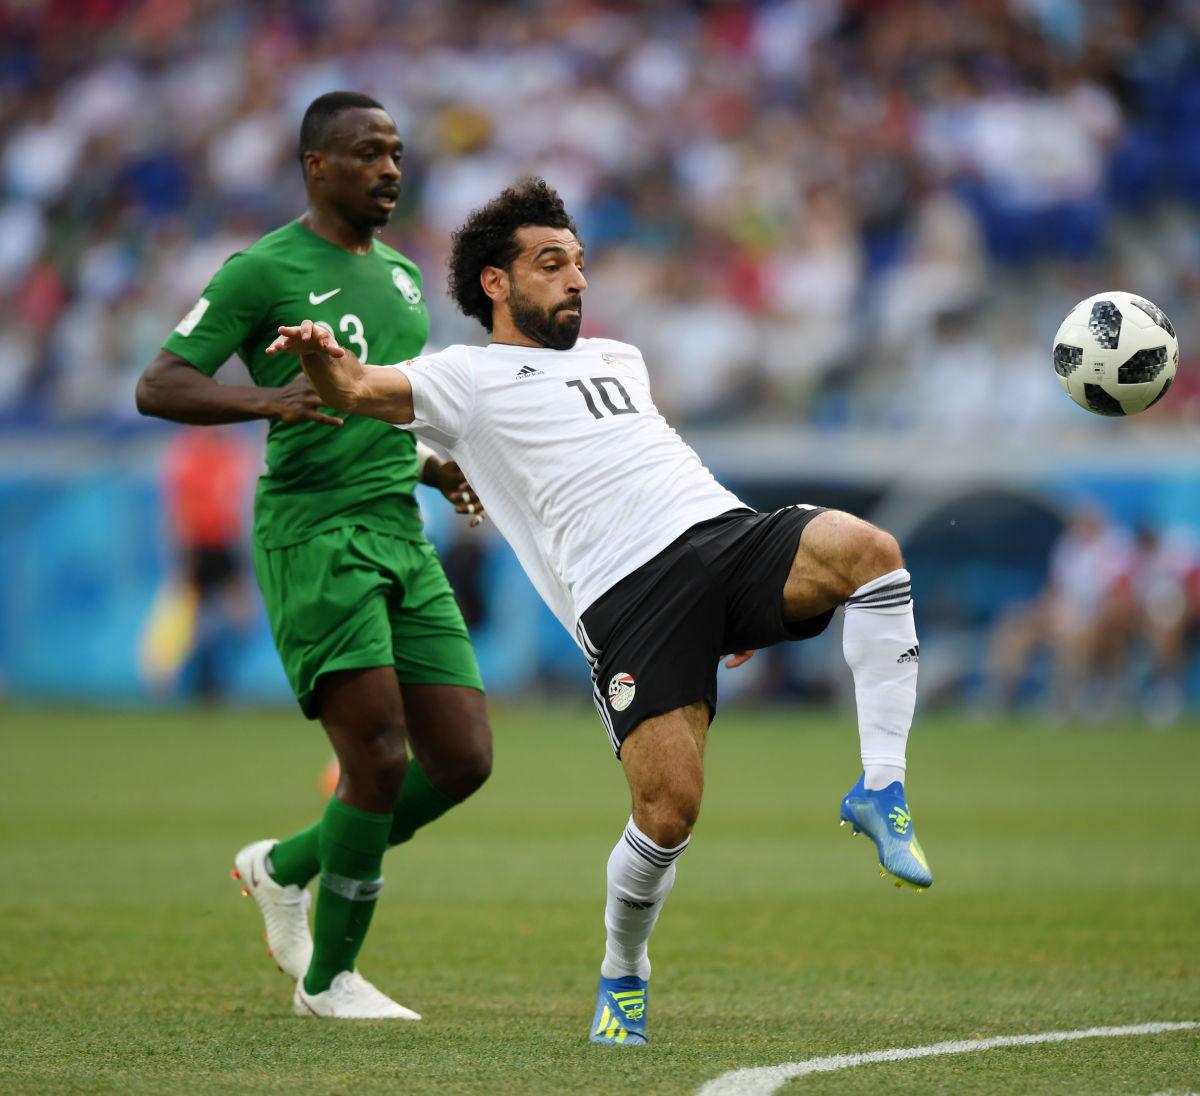 saudi-arabia-v-egypt-group-a-2018-fifa-world-cup-russia-5b3b81b2347a02730f000007.jpg